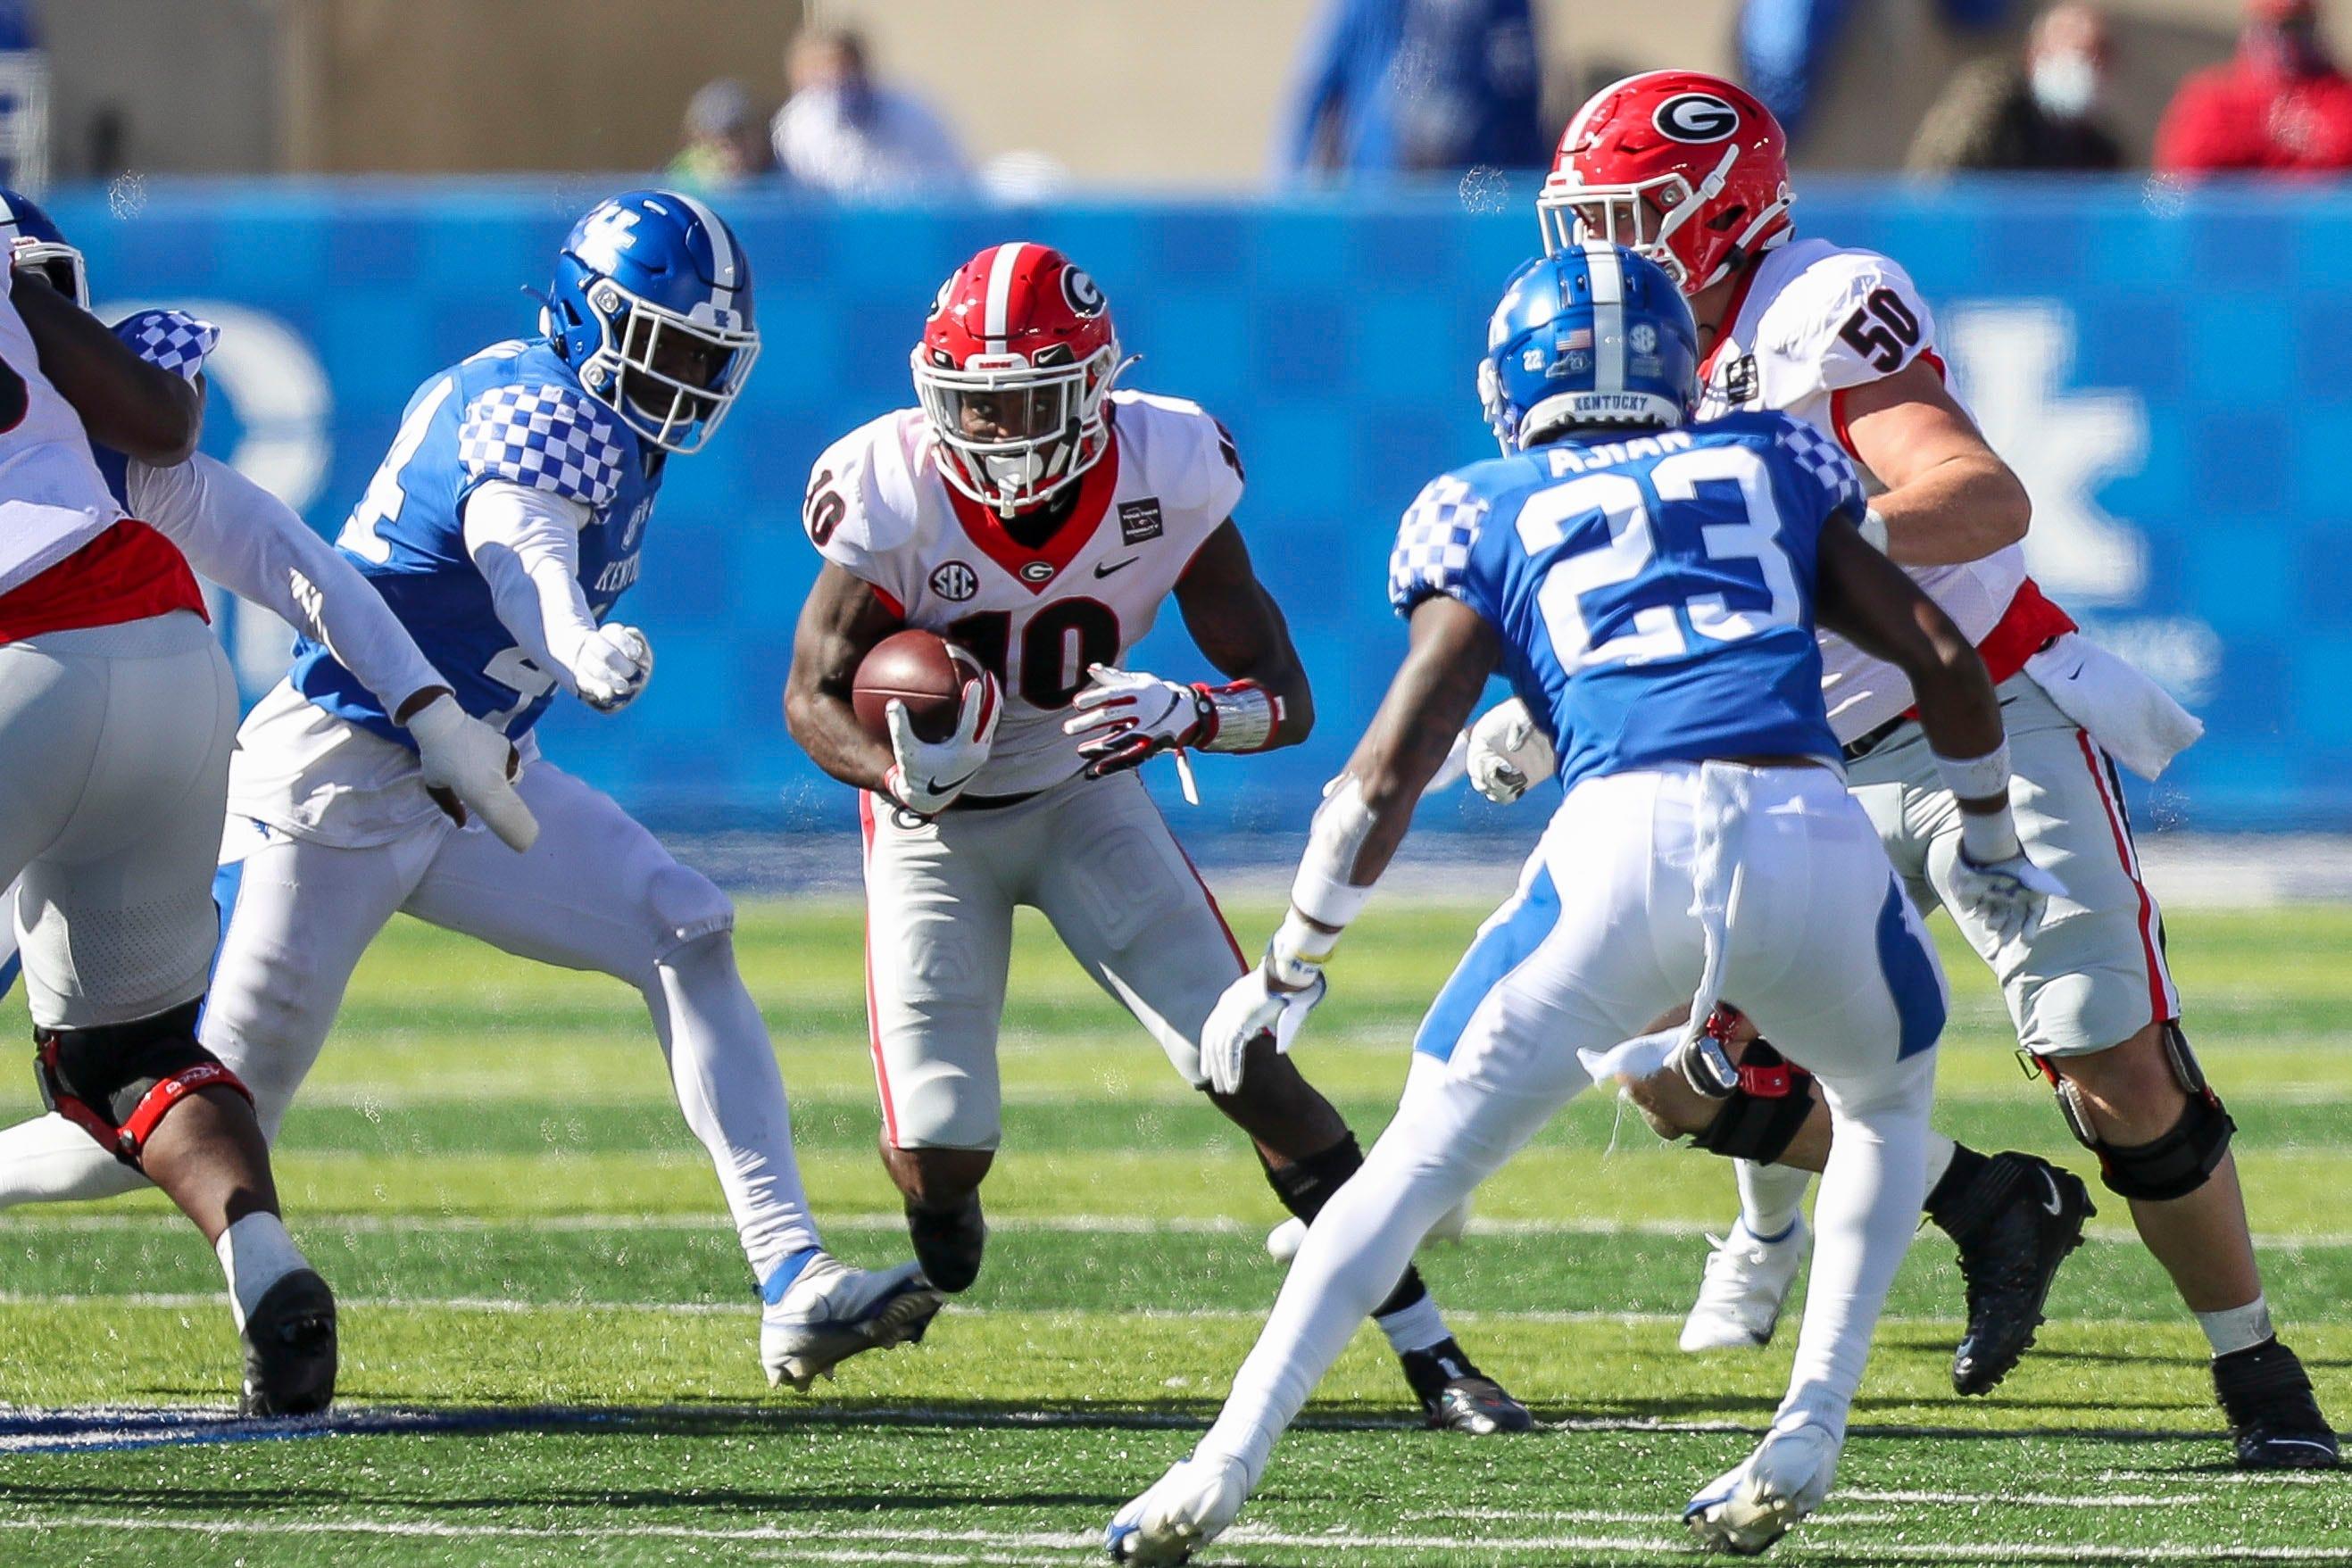 Week 7 college football picks, bold predictions led by Georgia-Kentucky showdown in SEC